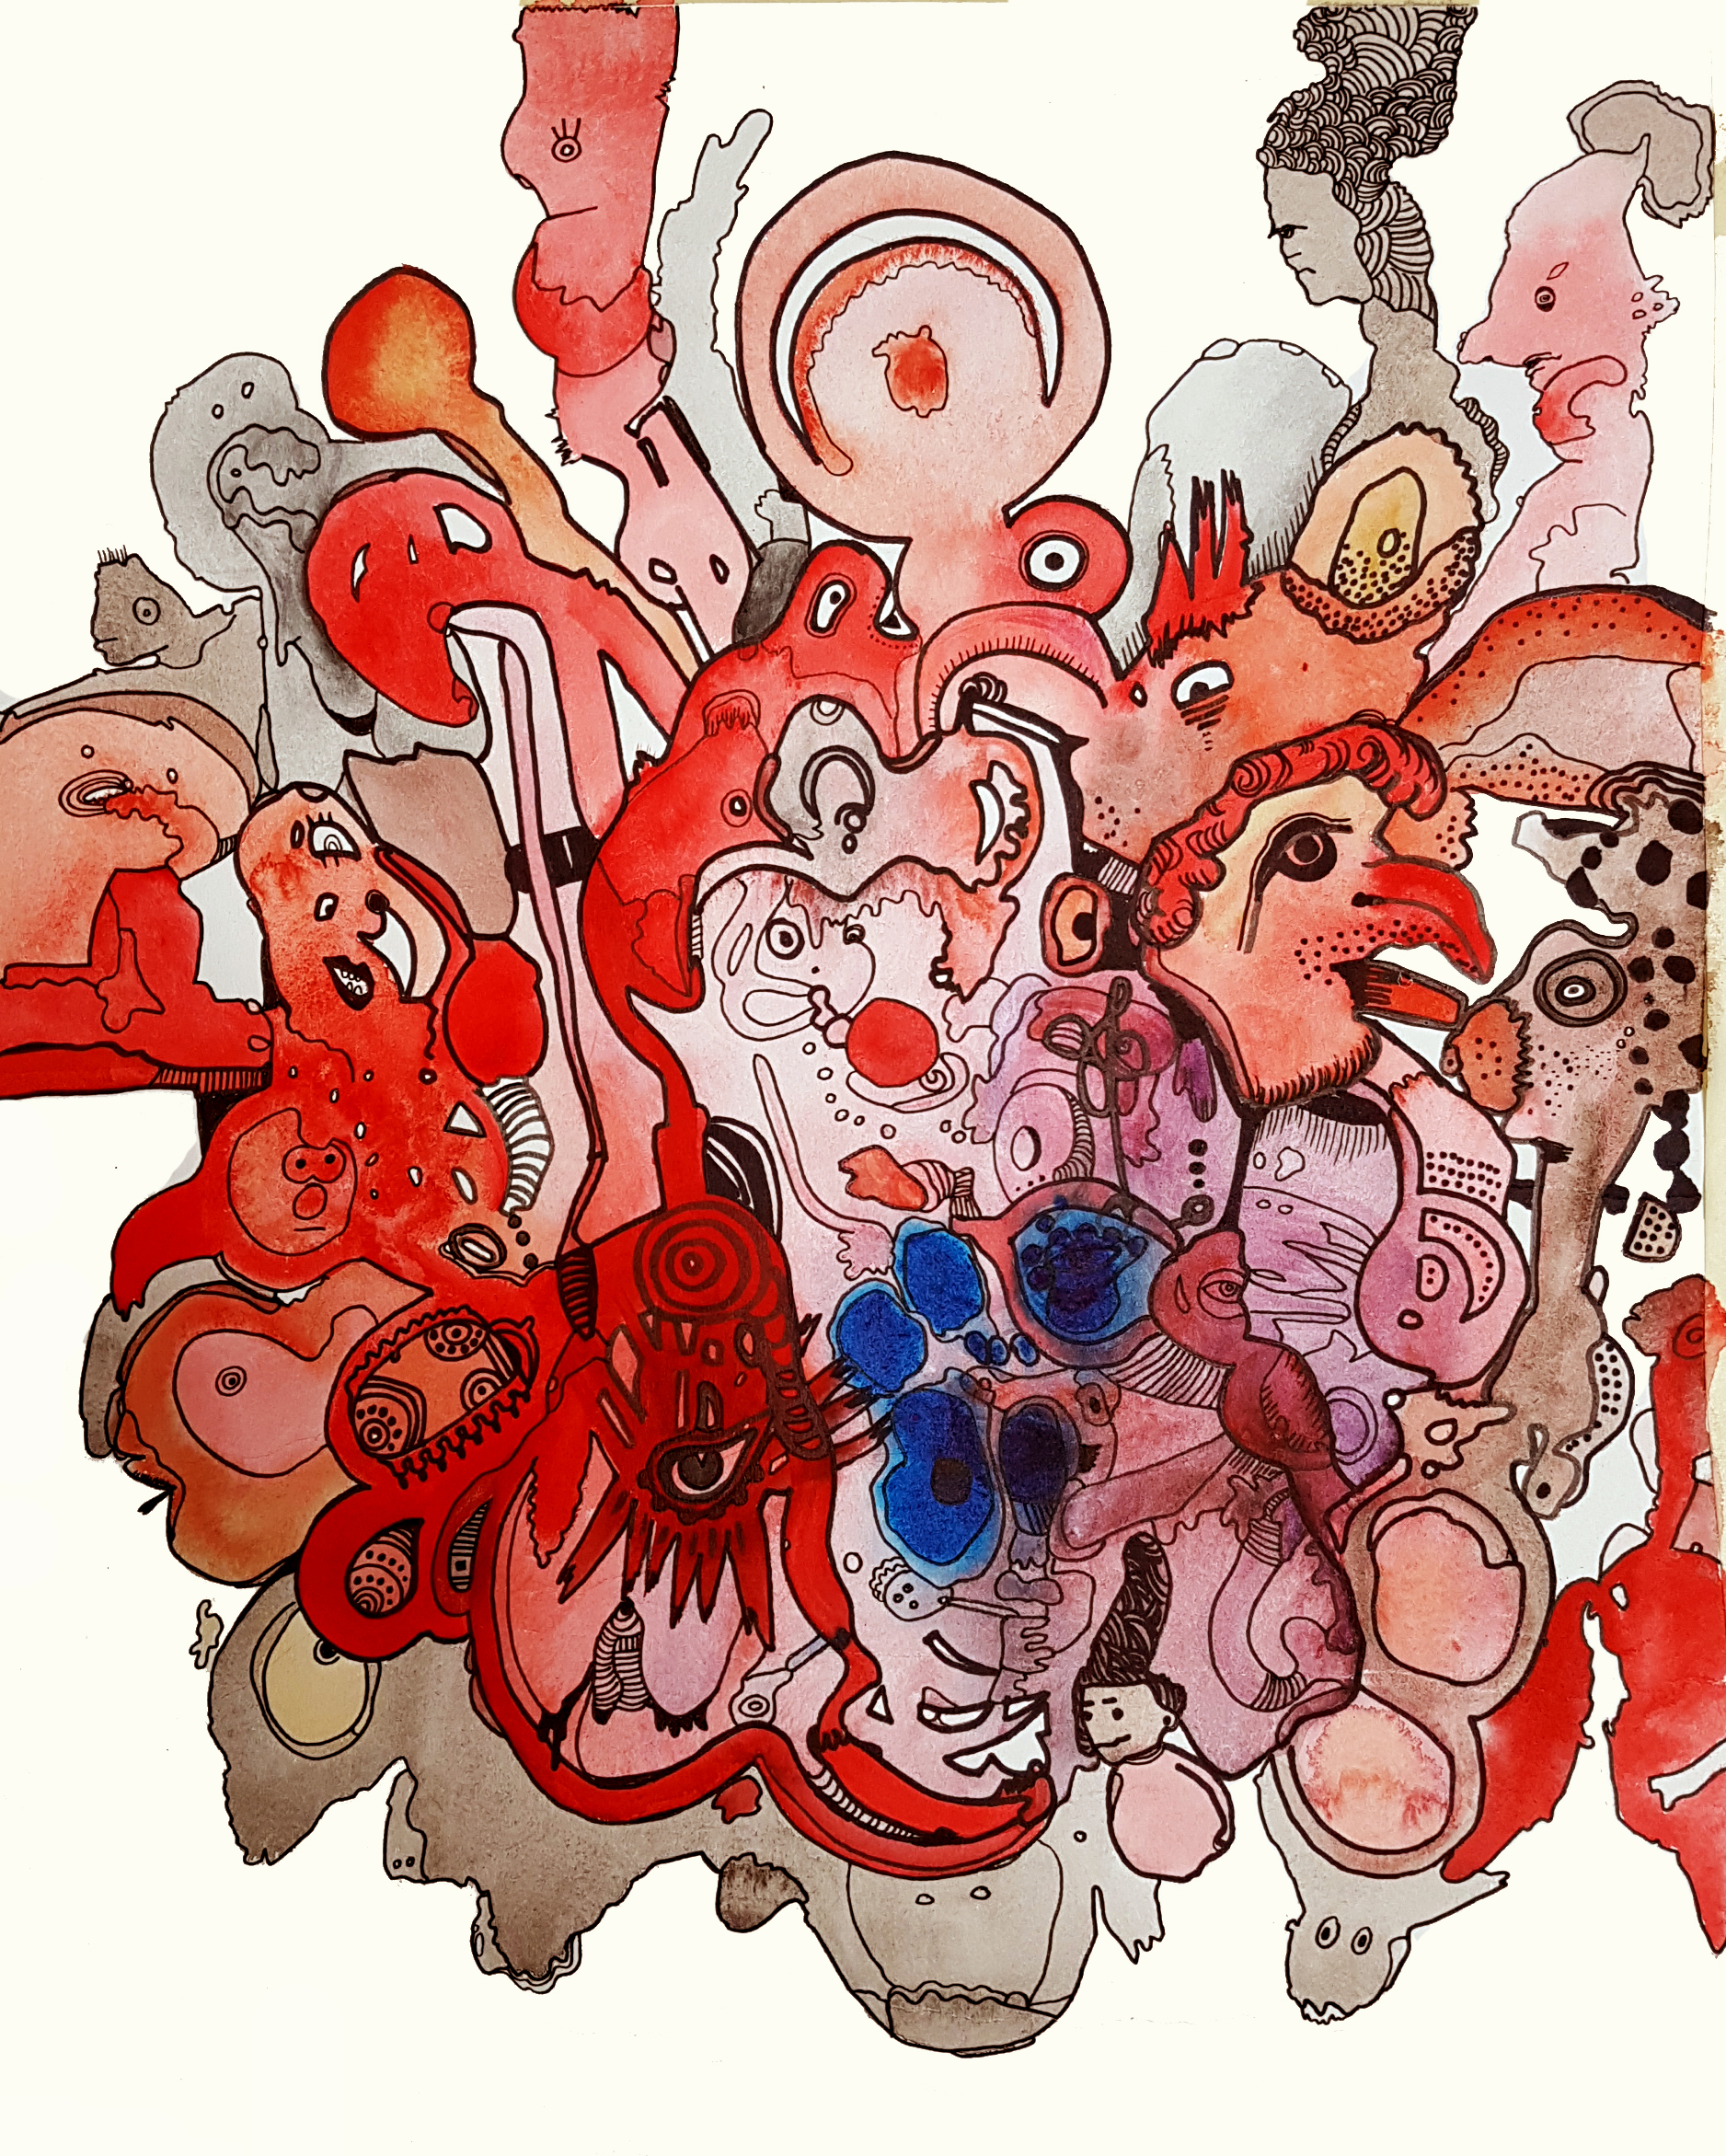 Watercolor on paper 50c45 cm